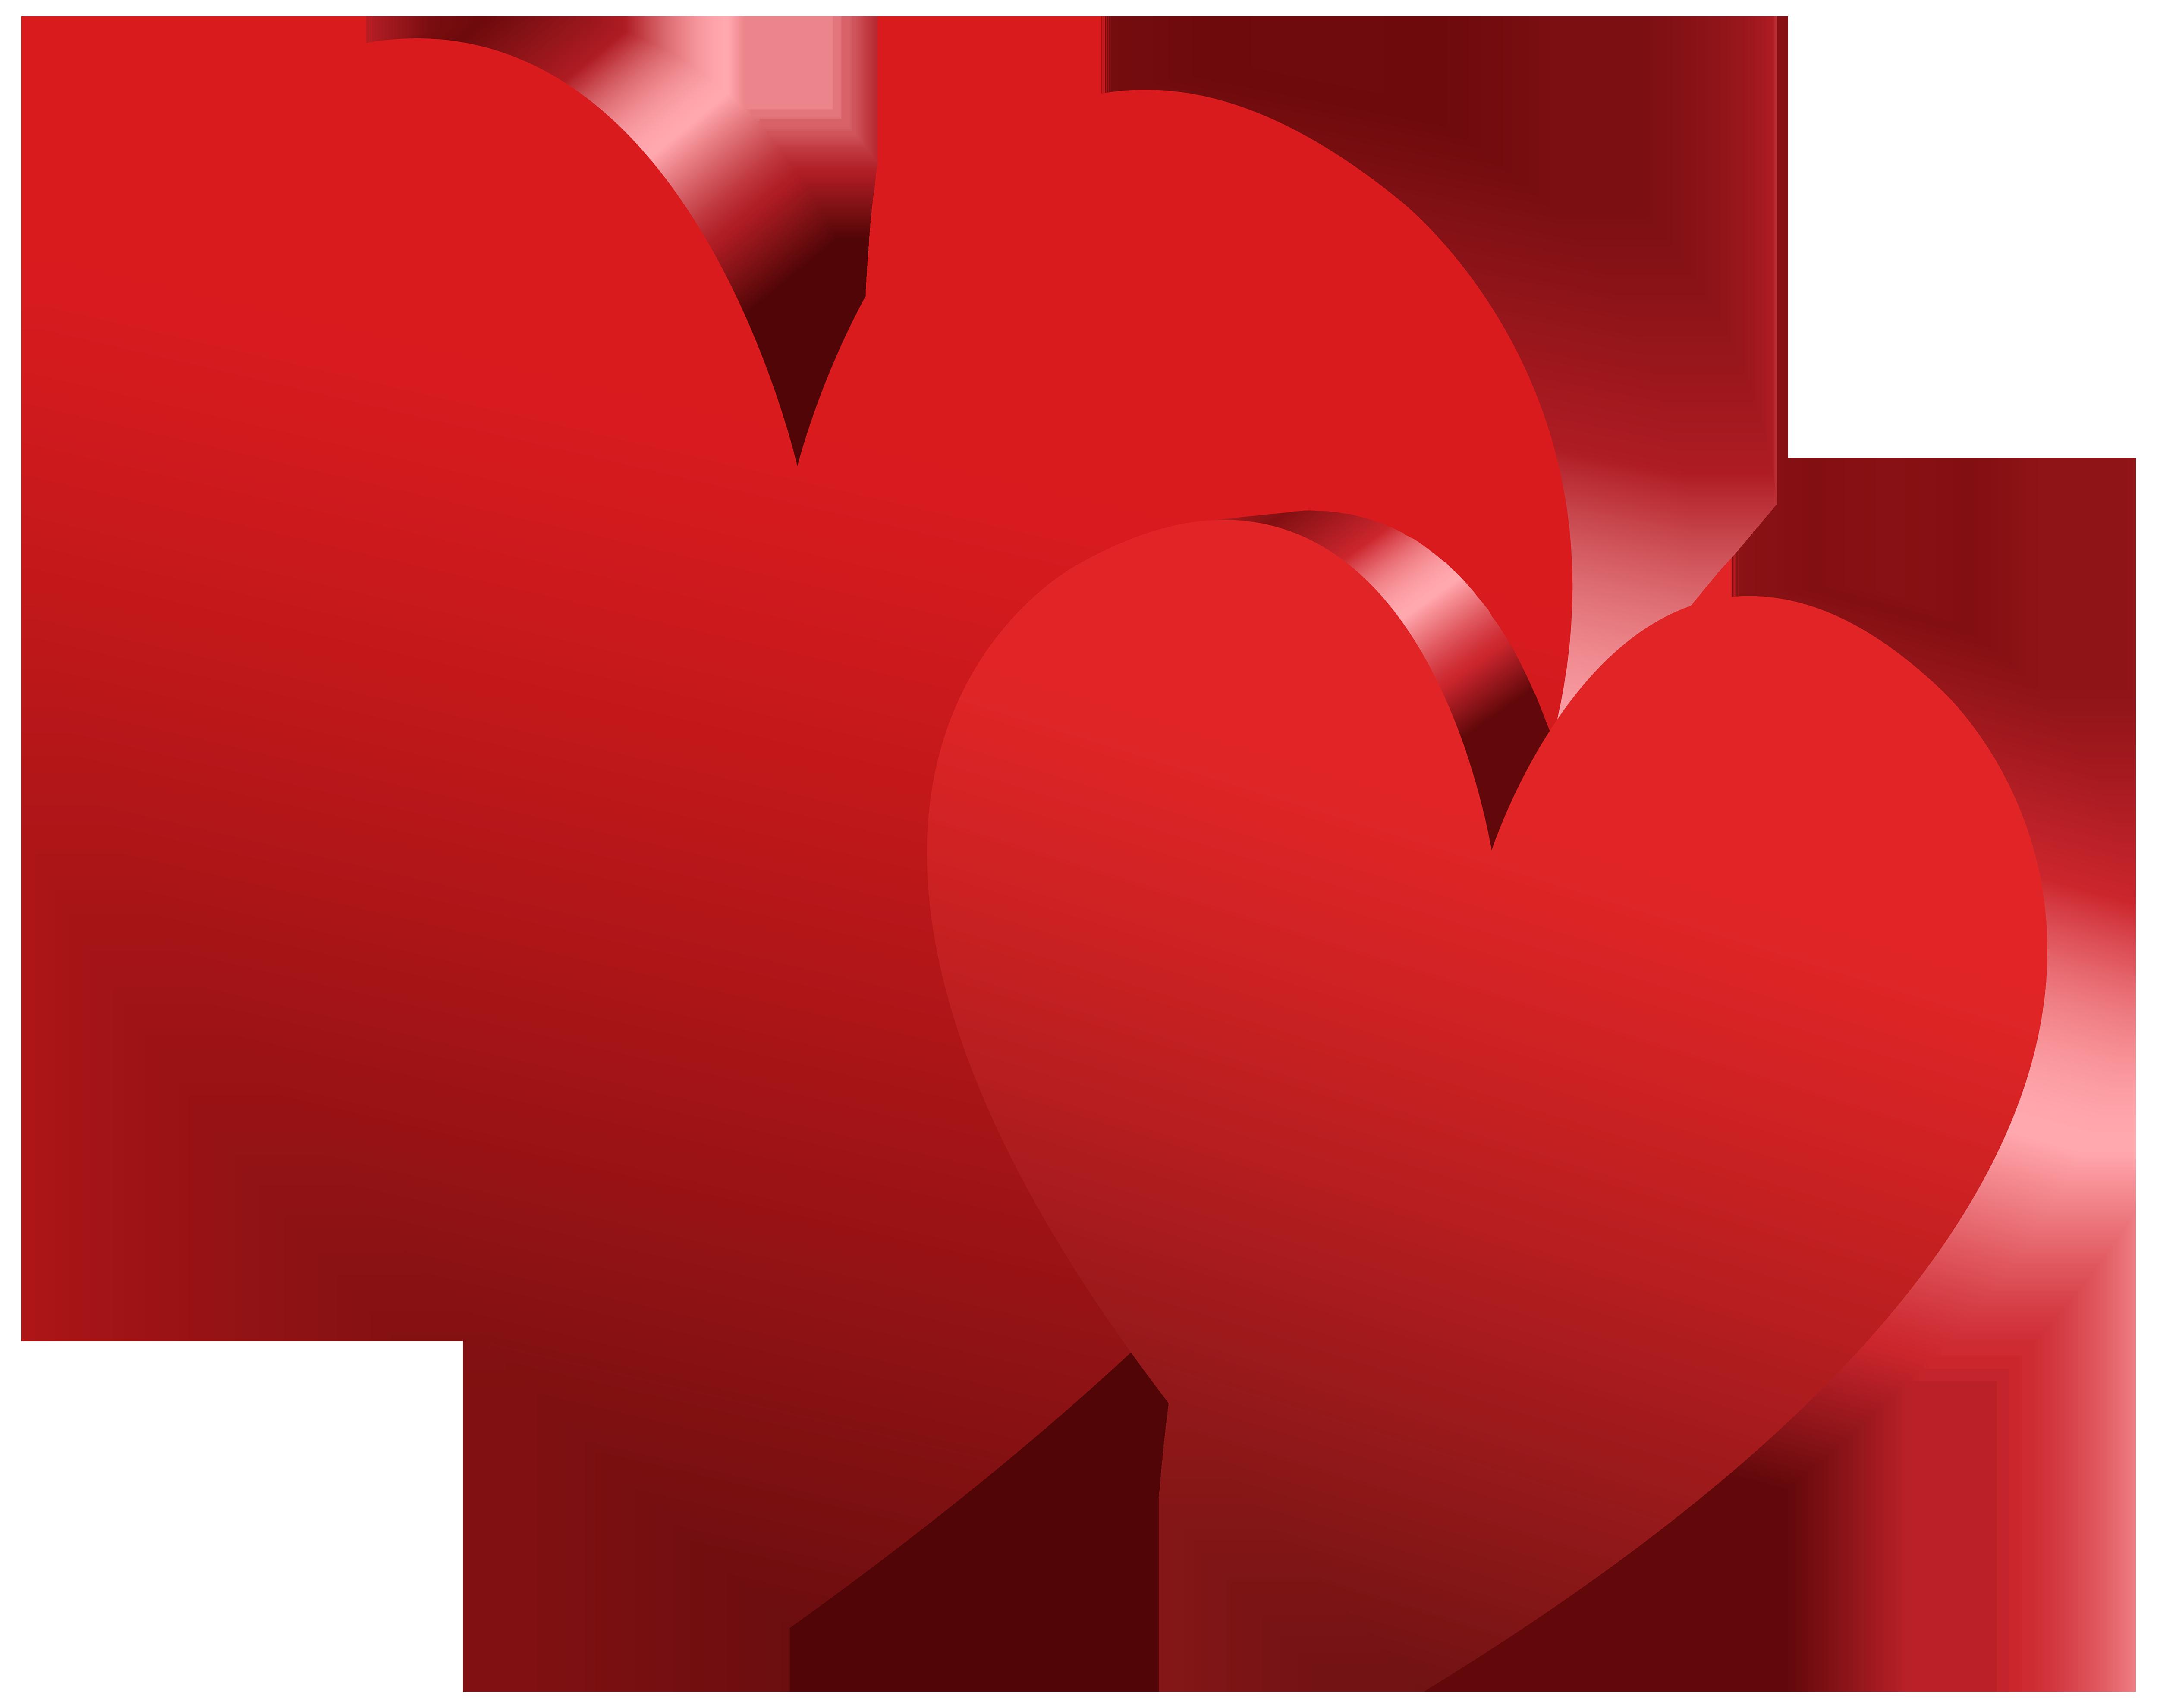 Single heart clipart svg transparent download Red Hearts PNG Clipart - Best WEB Clipart svg transparent download